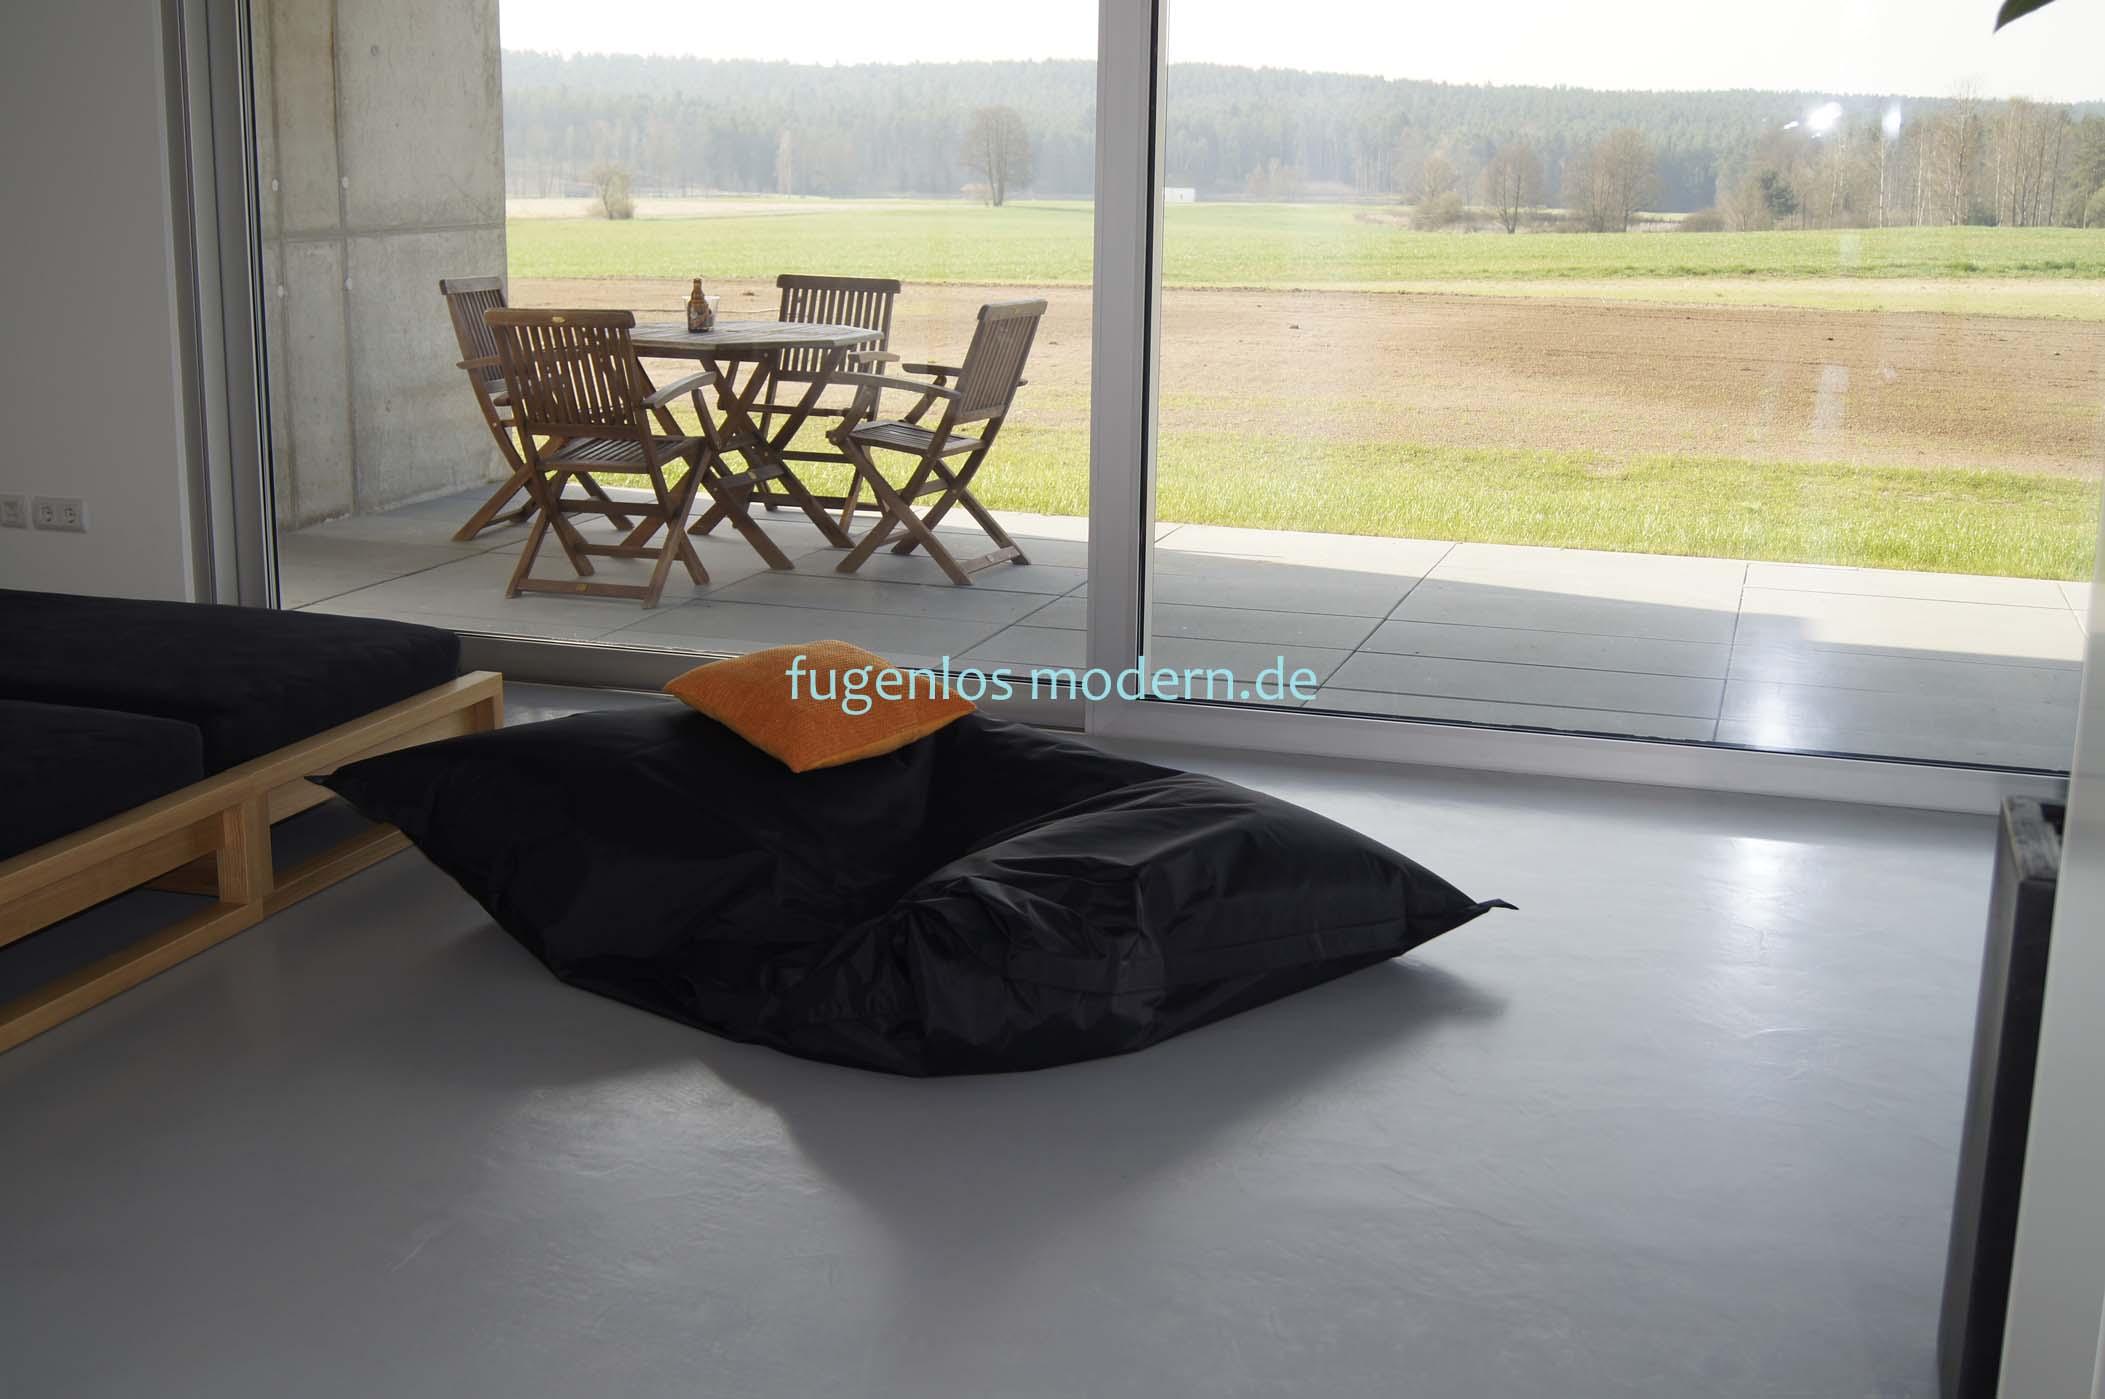 zementboden spachtelb den bad ohne fliesen fugenlos. Black Bedroom Furniture Sets. Home Design Ideas